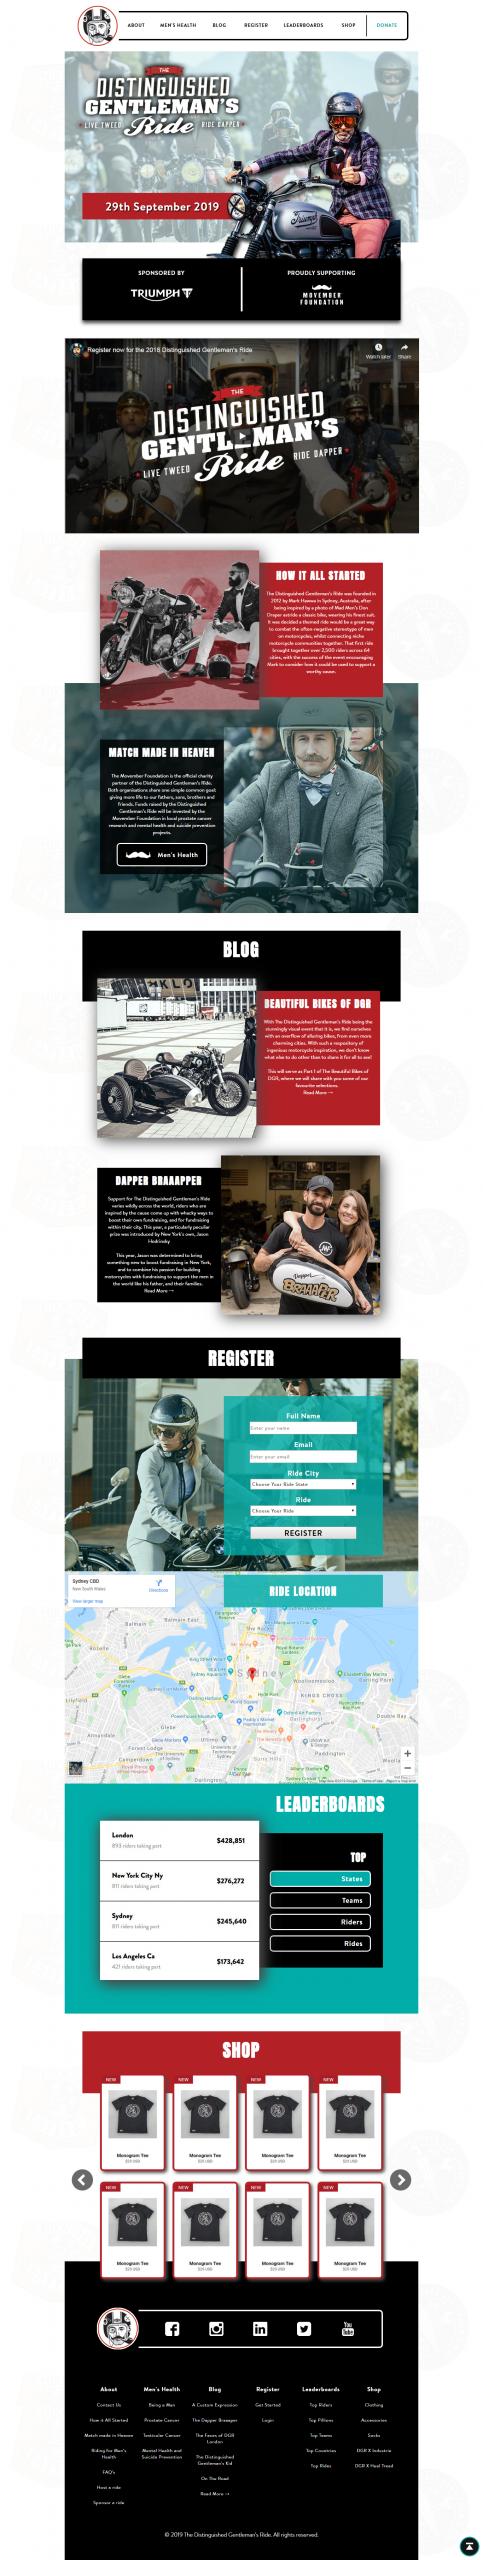 web_gentlemensride_fullscreenshot01